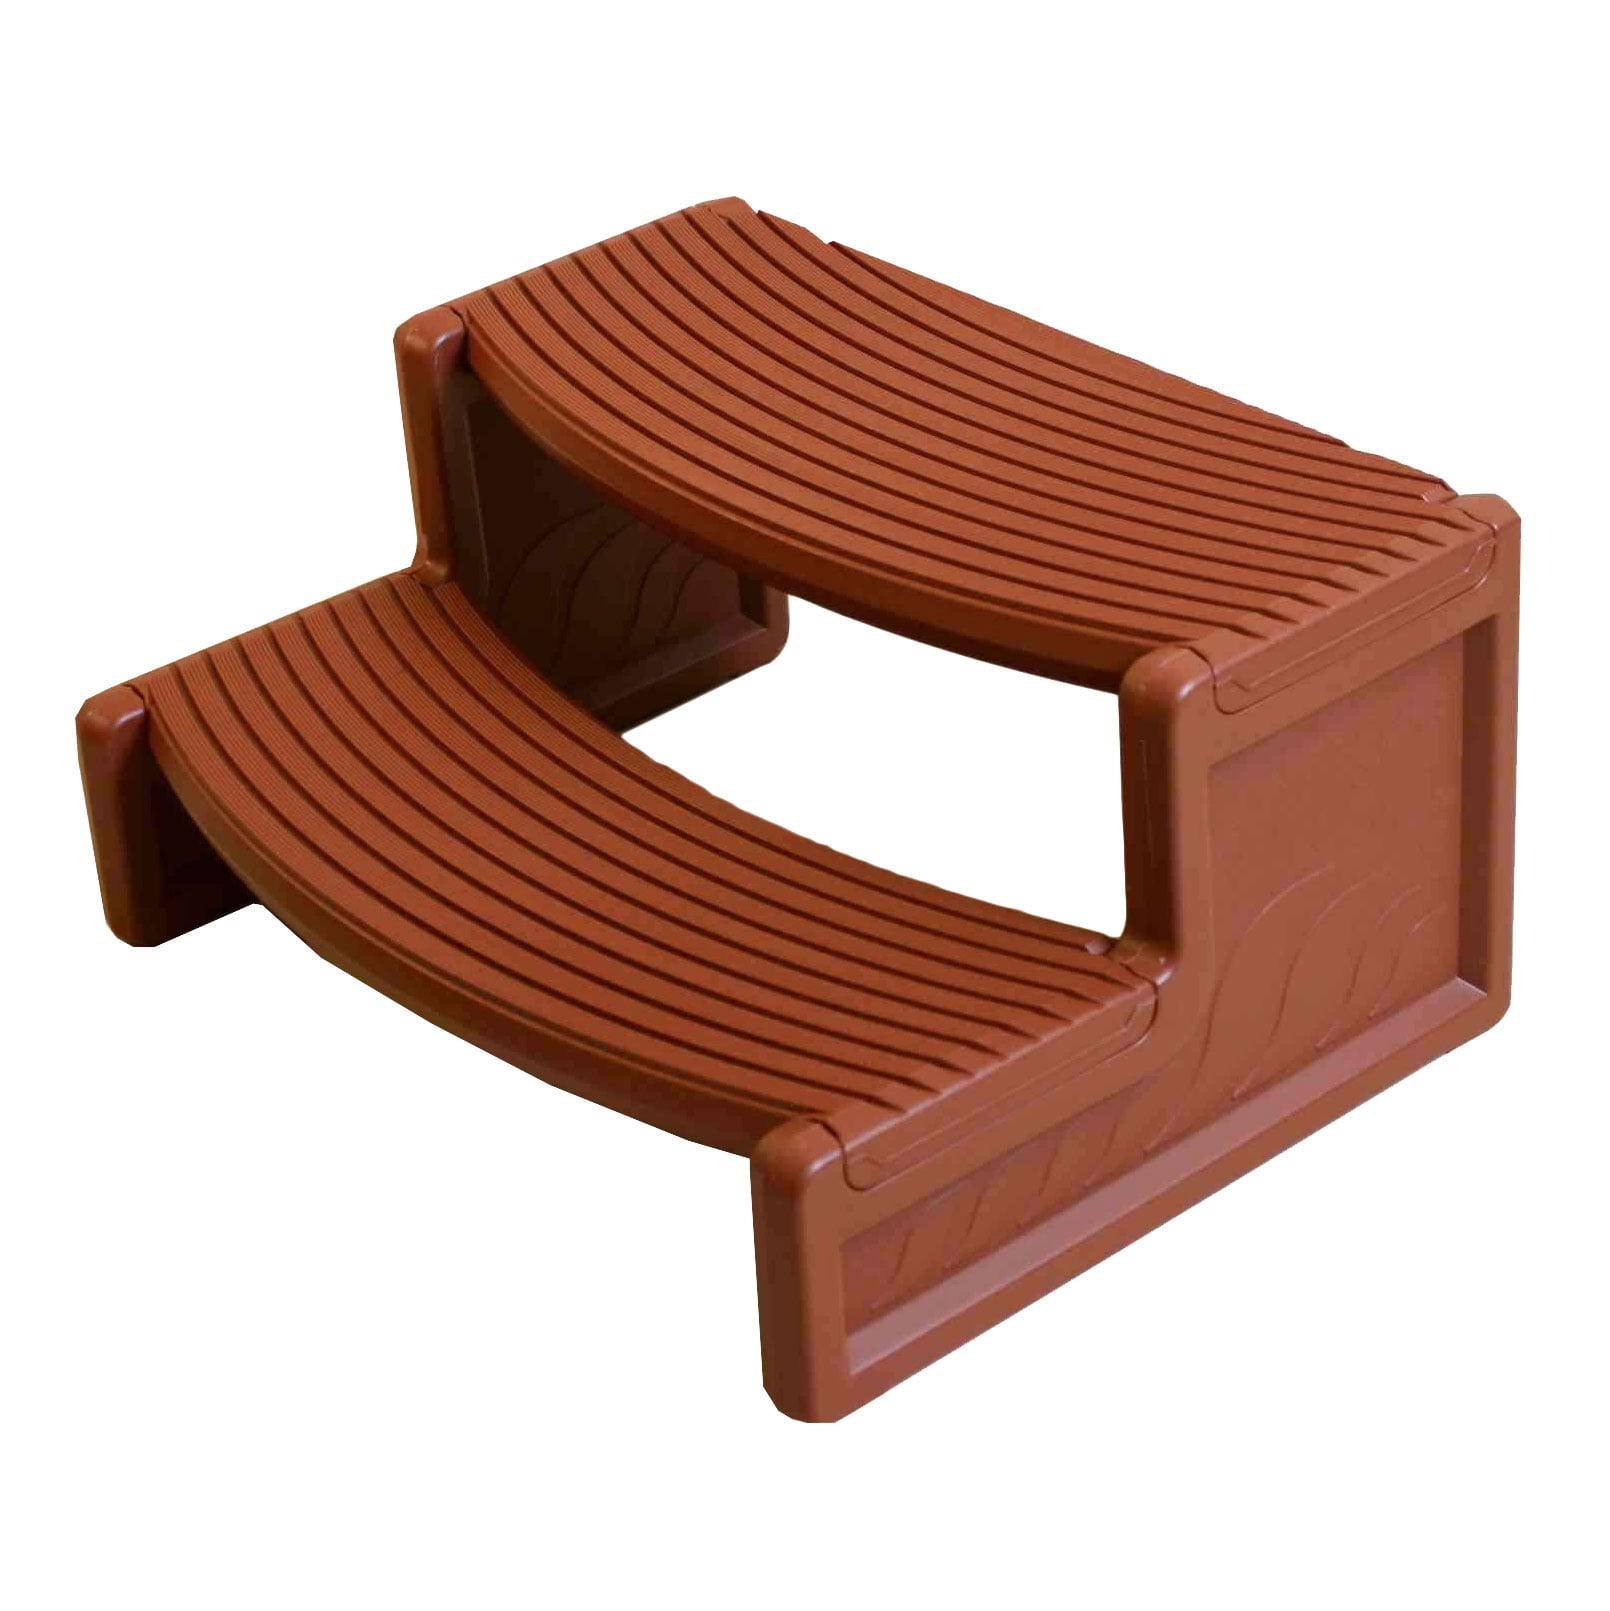 Confer Plastics HS2-R Resin Multi Purpose Spa Hot Tub Handi-Step Steps, Redwood